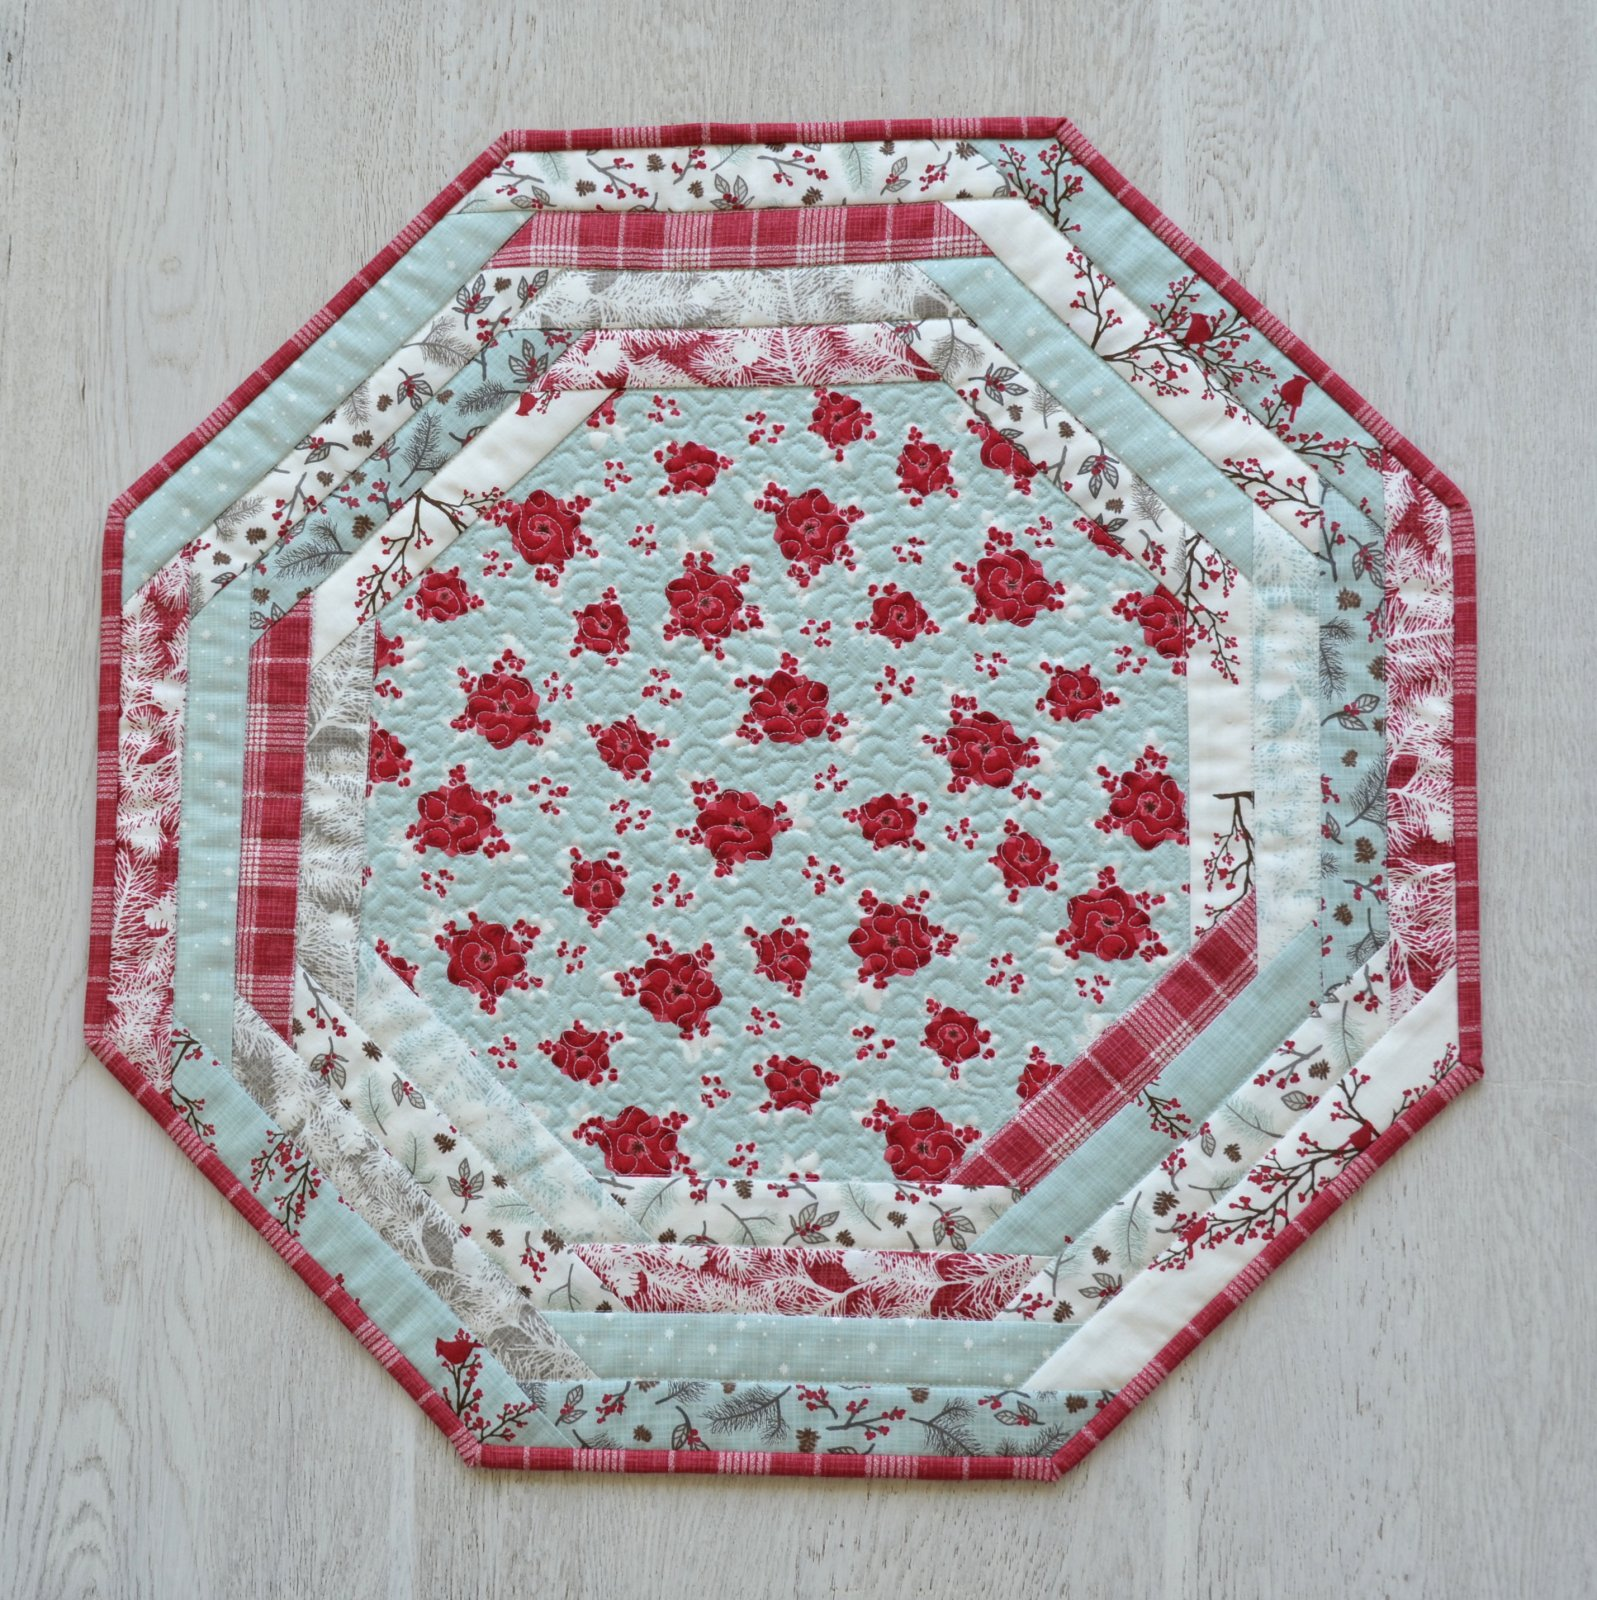 Centerpiece Tablemat - Winter's Lane